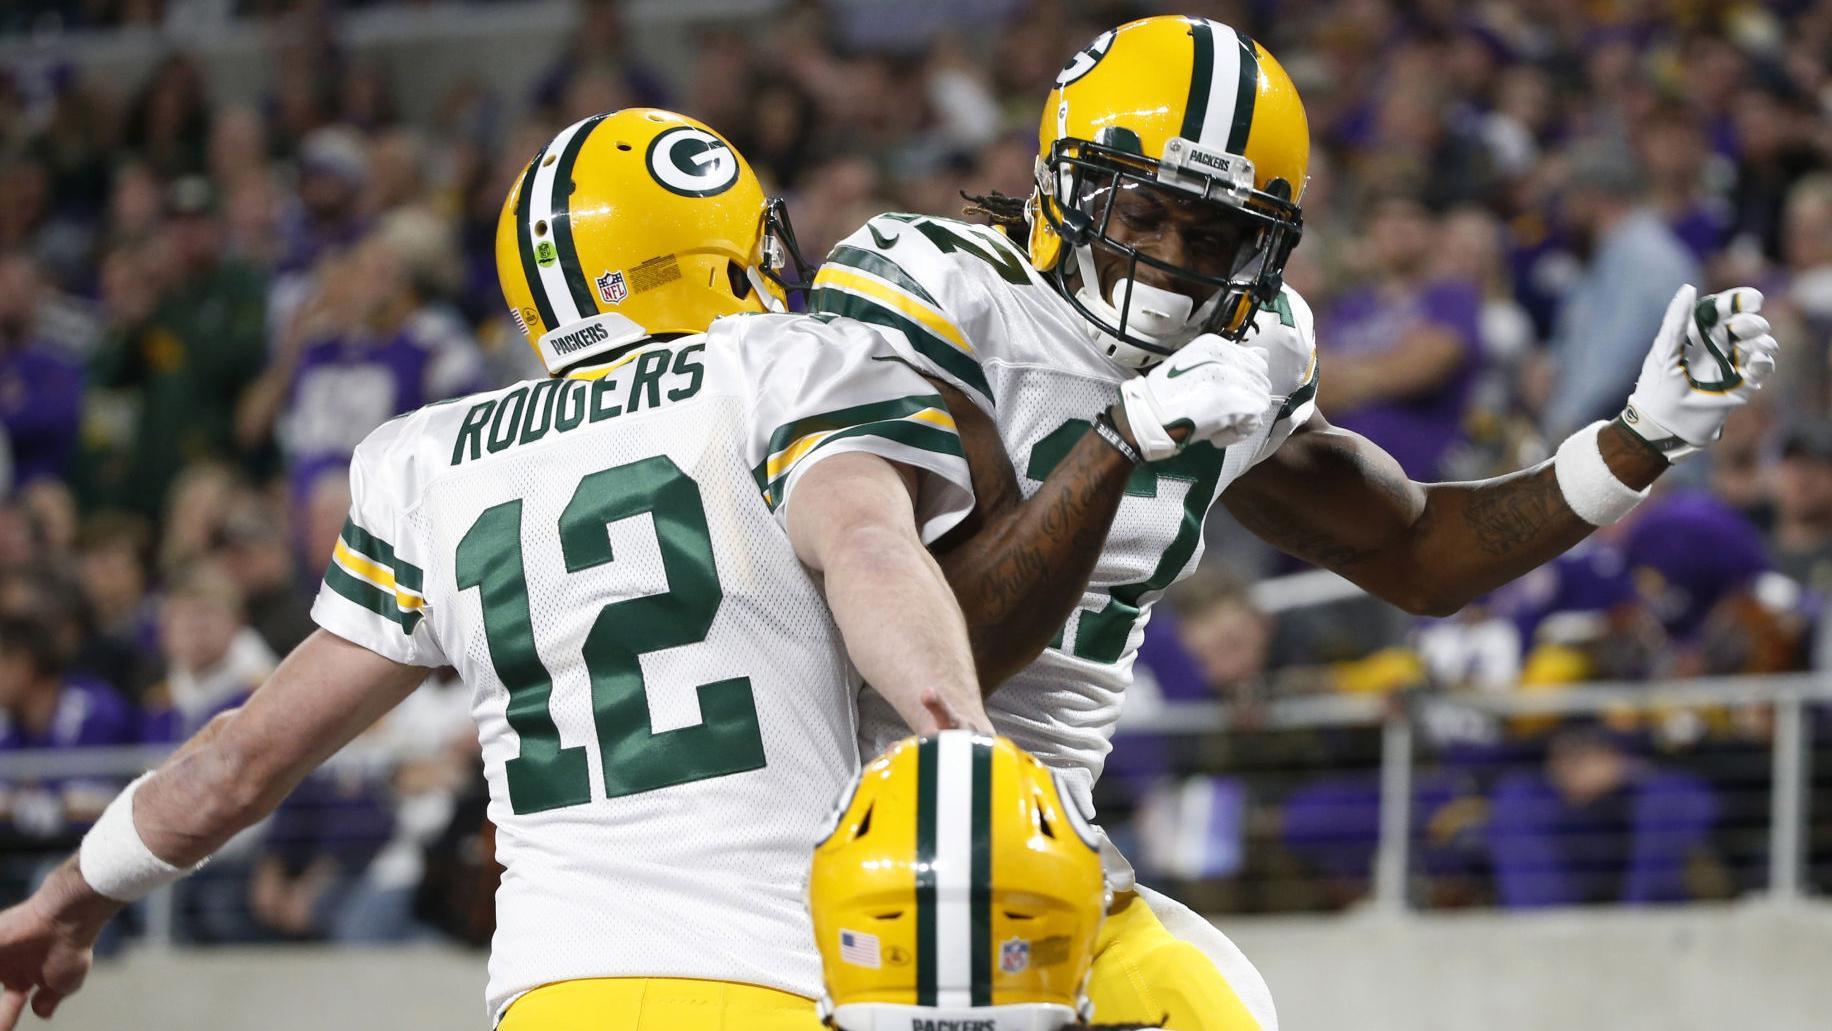 Davante Adams' first impression of new Packers coach Matt LaFleur? 'Innovative,' 'really relatable'